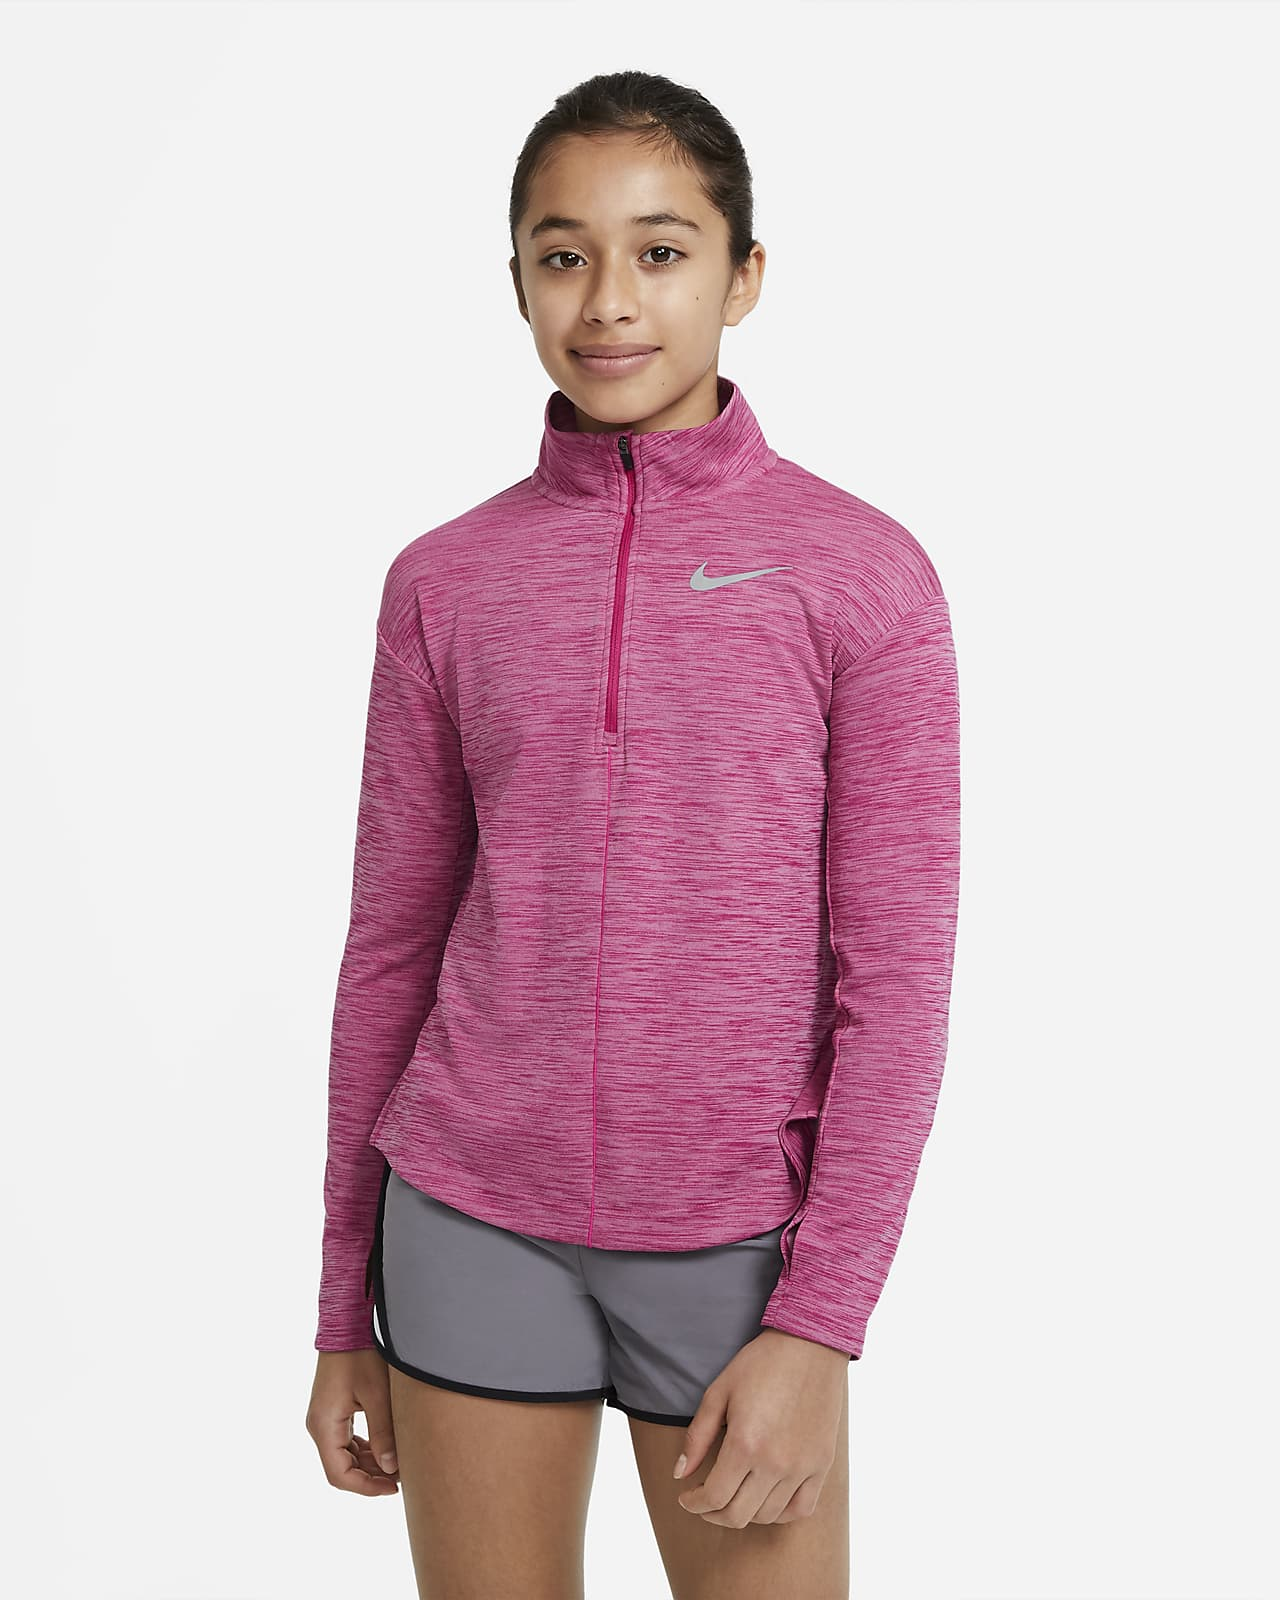 Nike Hardlooptop met lange mouwen en halflange rits voor meisjes